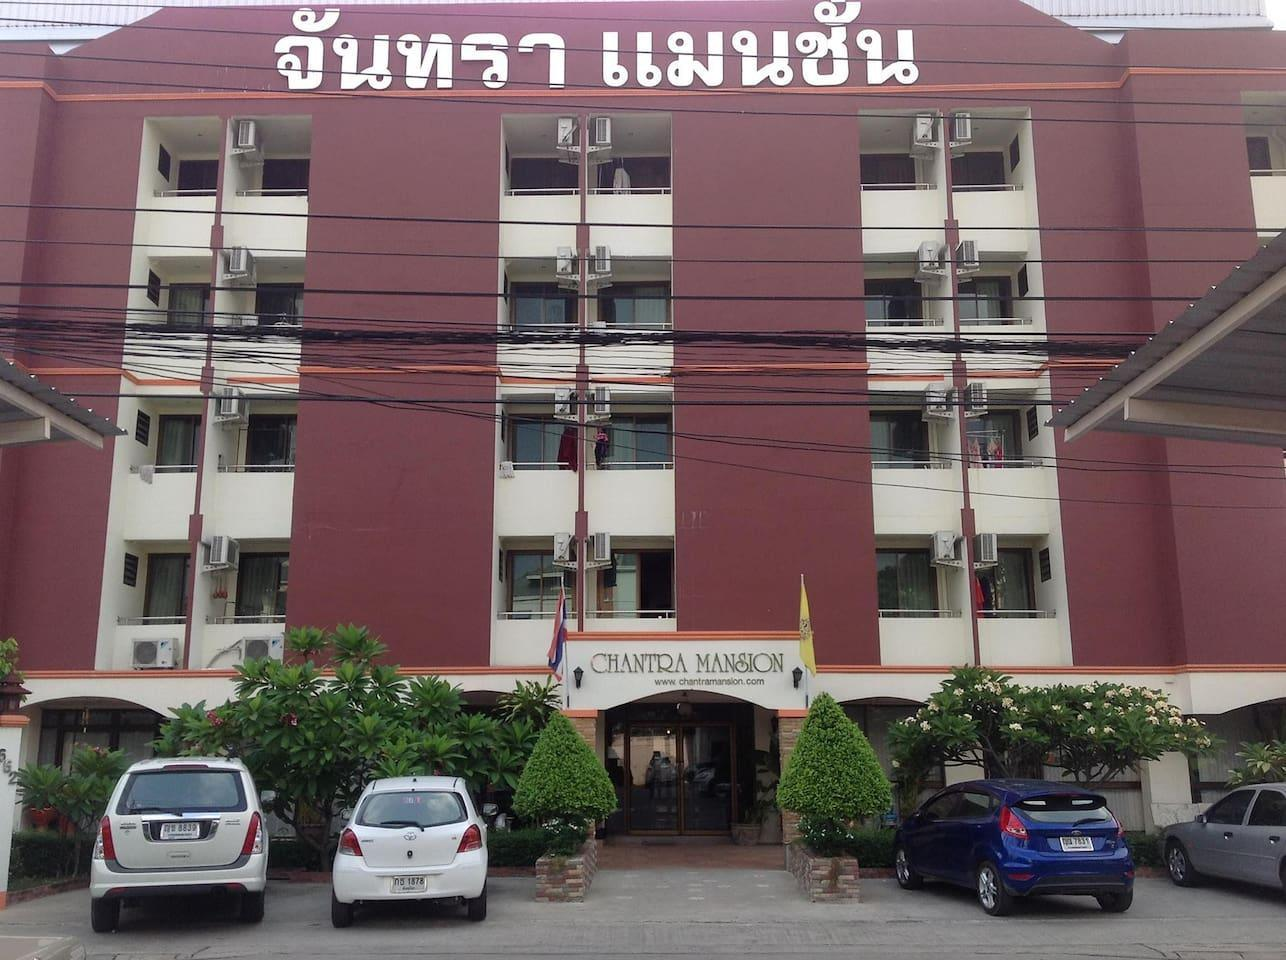 Chantra Mansion